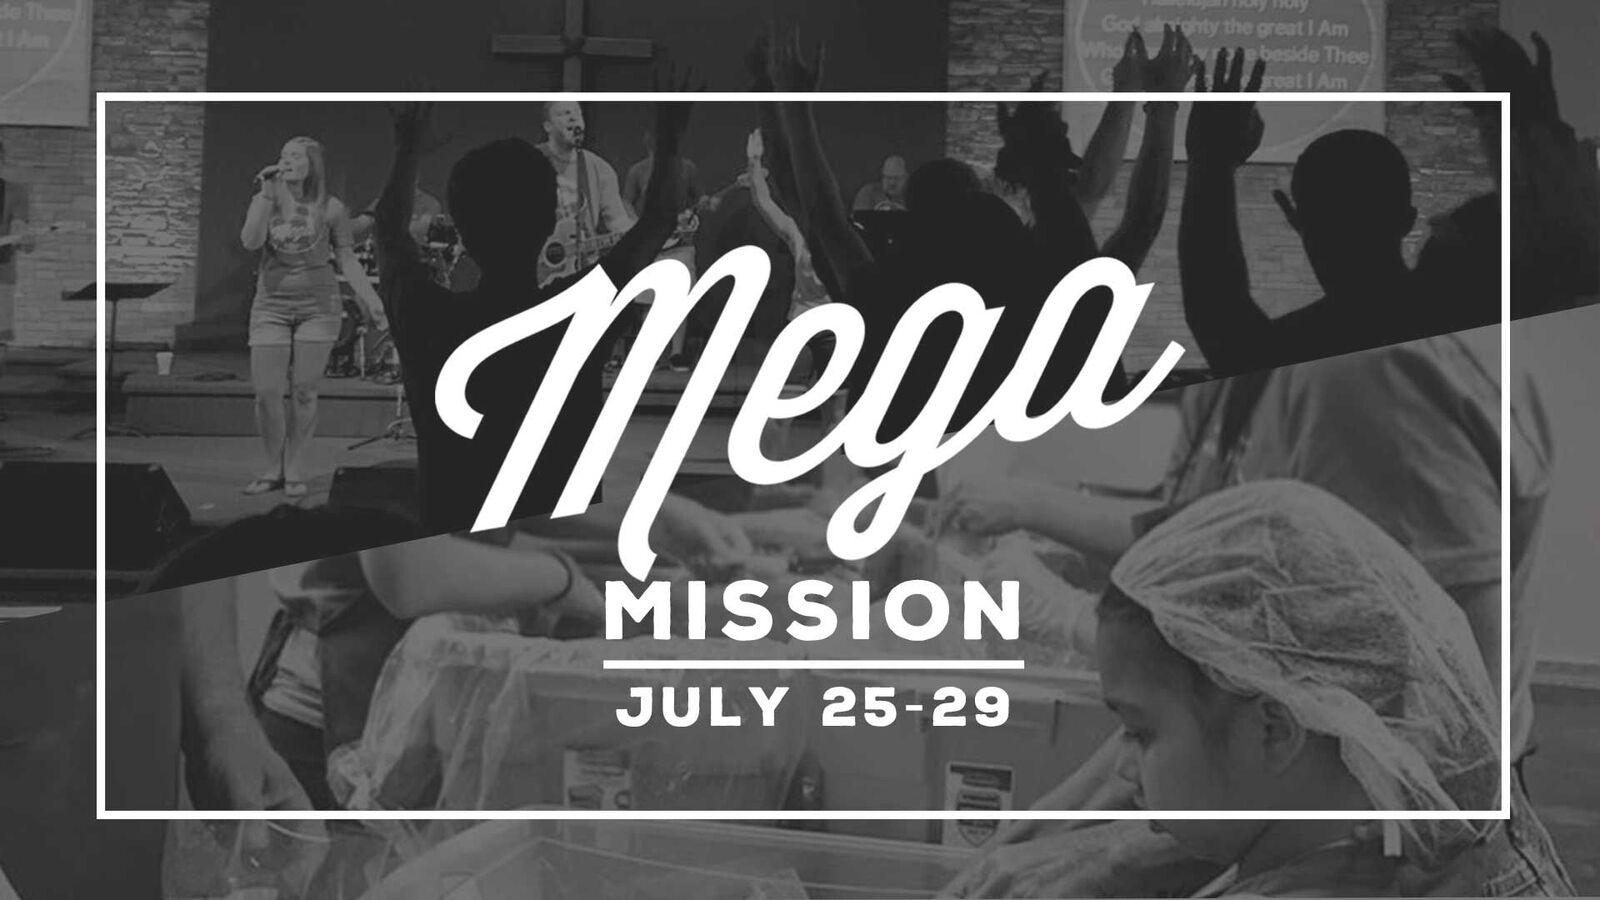 Lake mega mission app wide preview